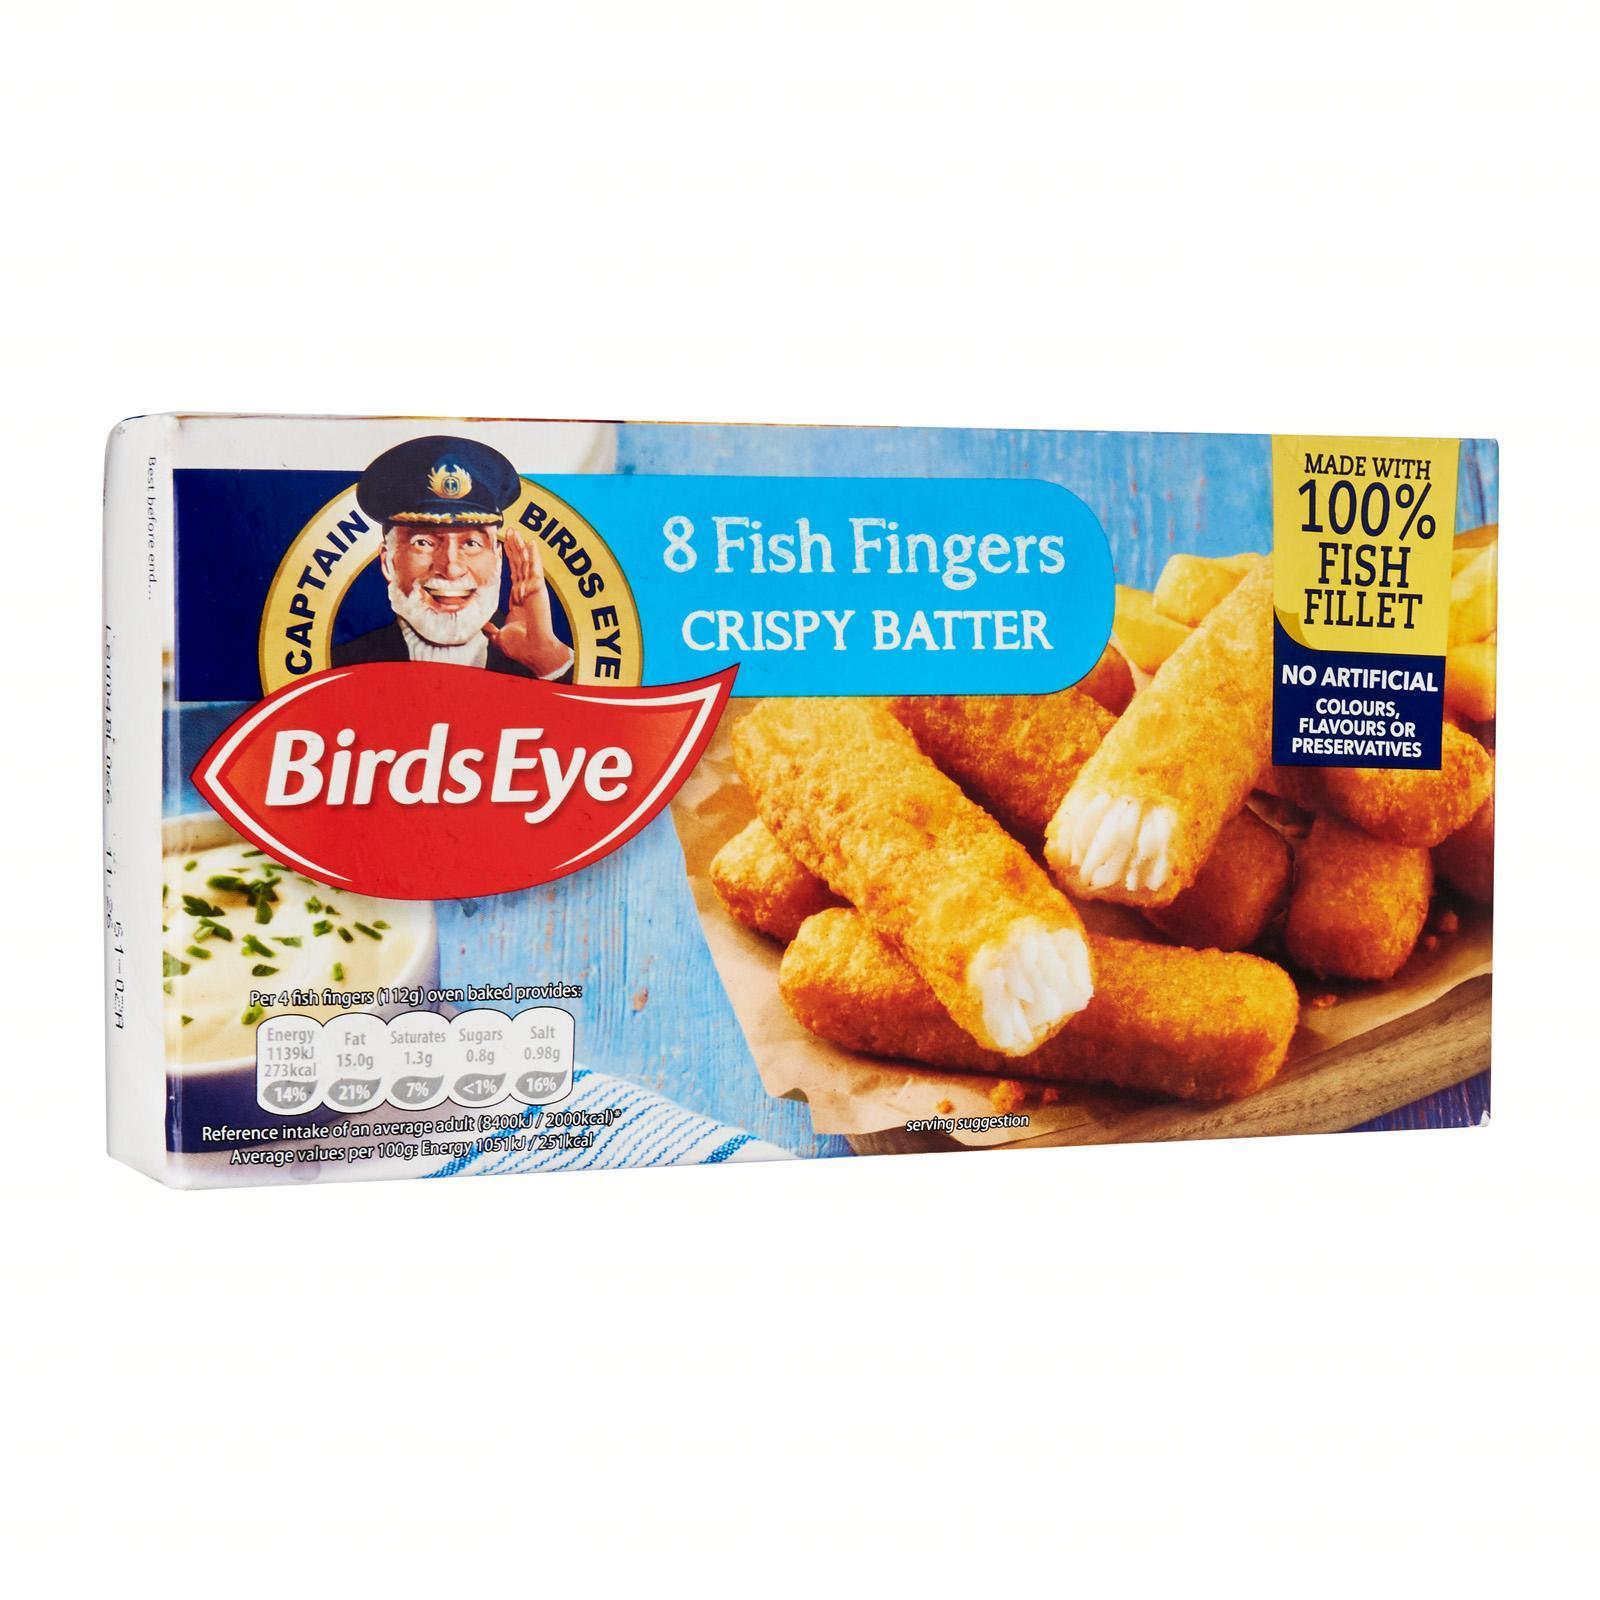 Birds Eye Crispy Battered Fish Fingers - Frozen